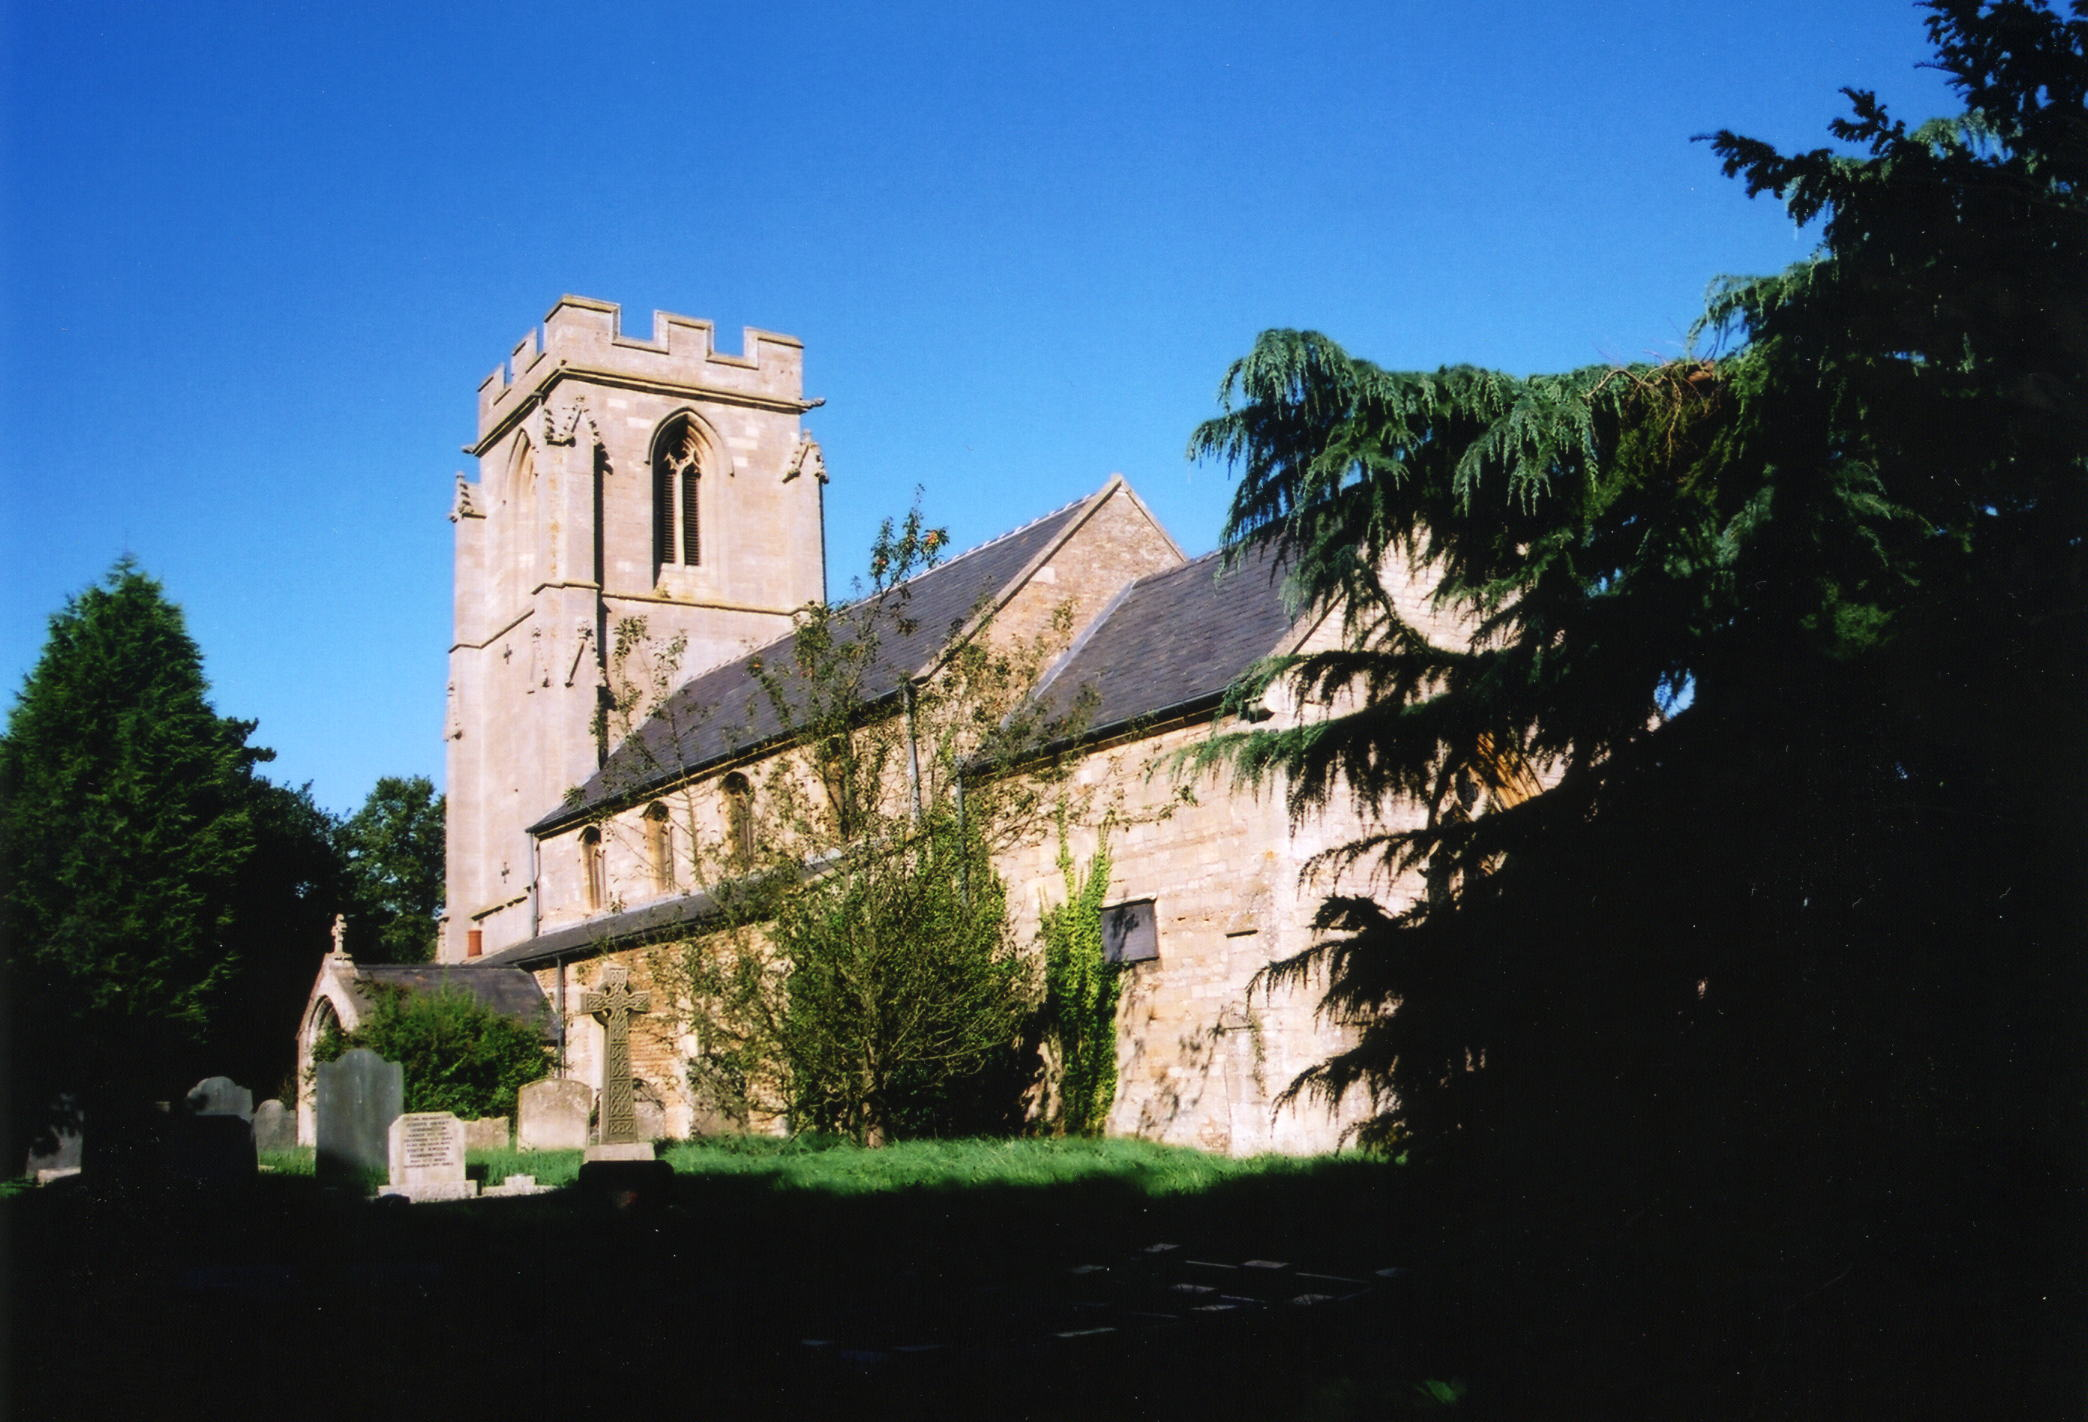 Dunsby All Saints Church